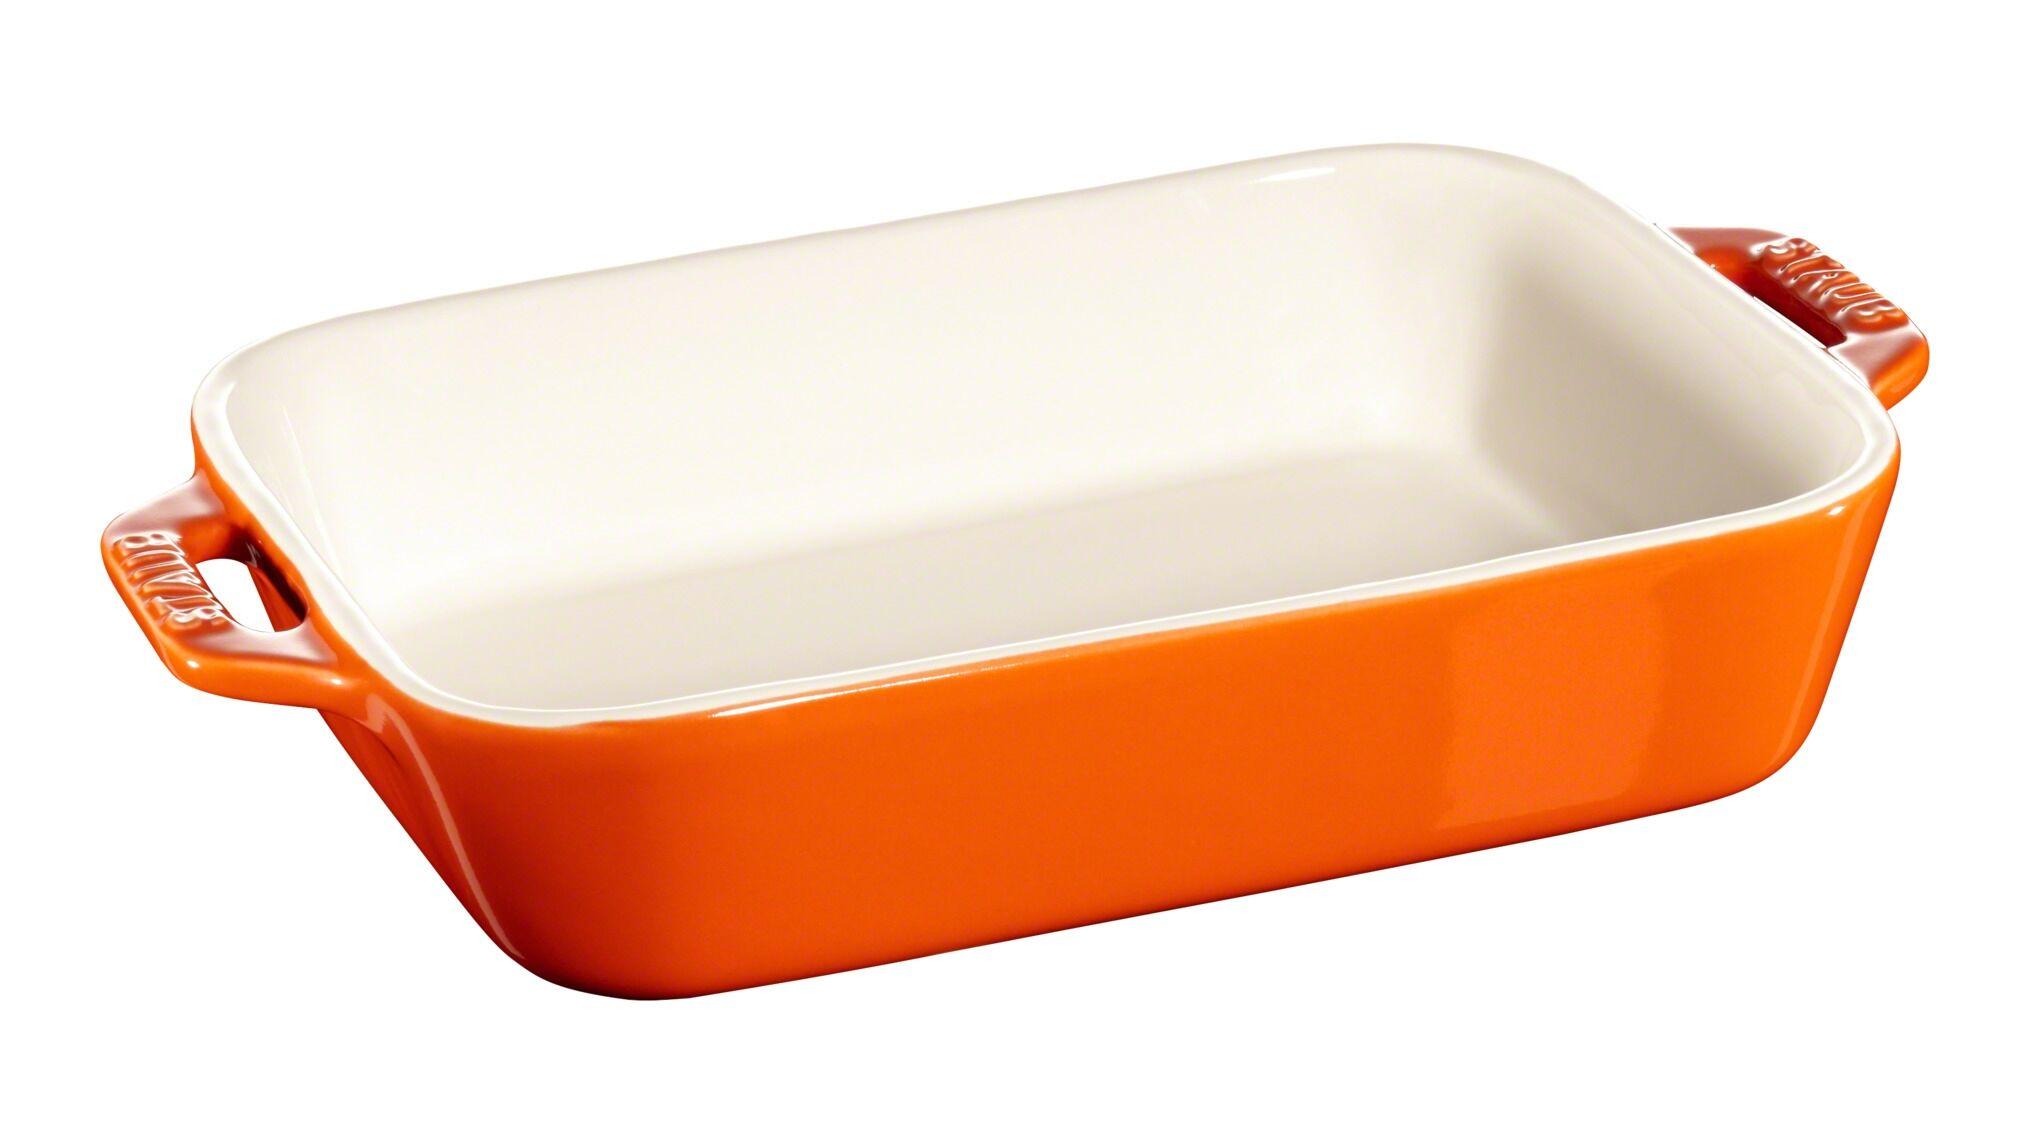 Staub Rektangulært fad, orange, 26x17cm, Tilberedning, Orange